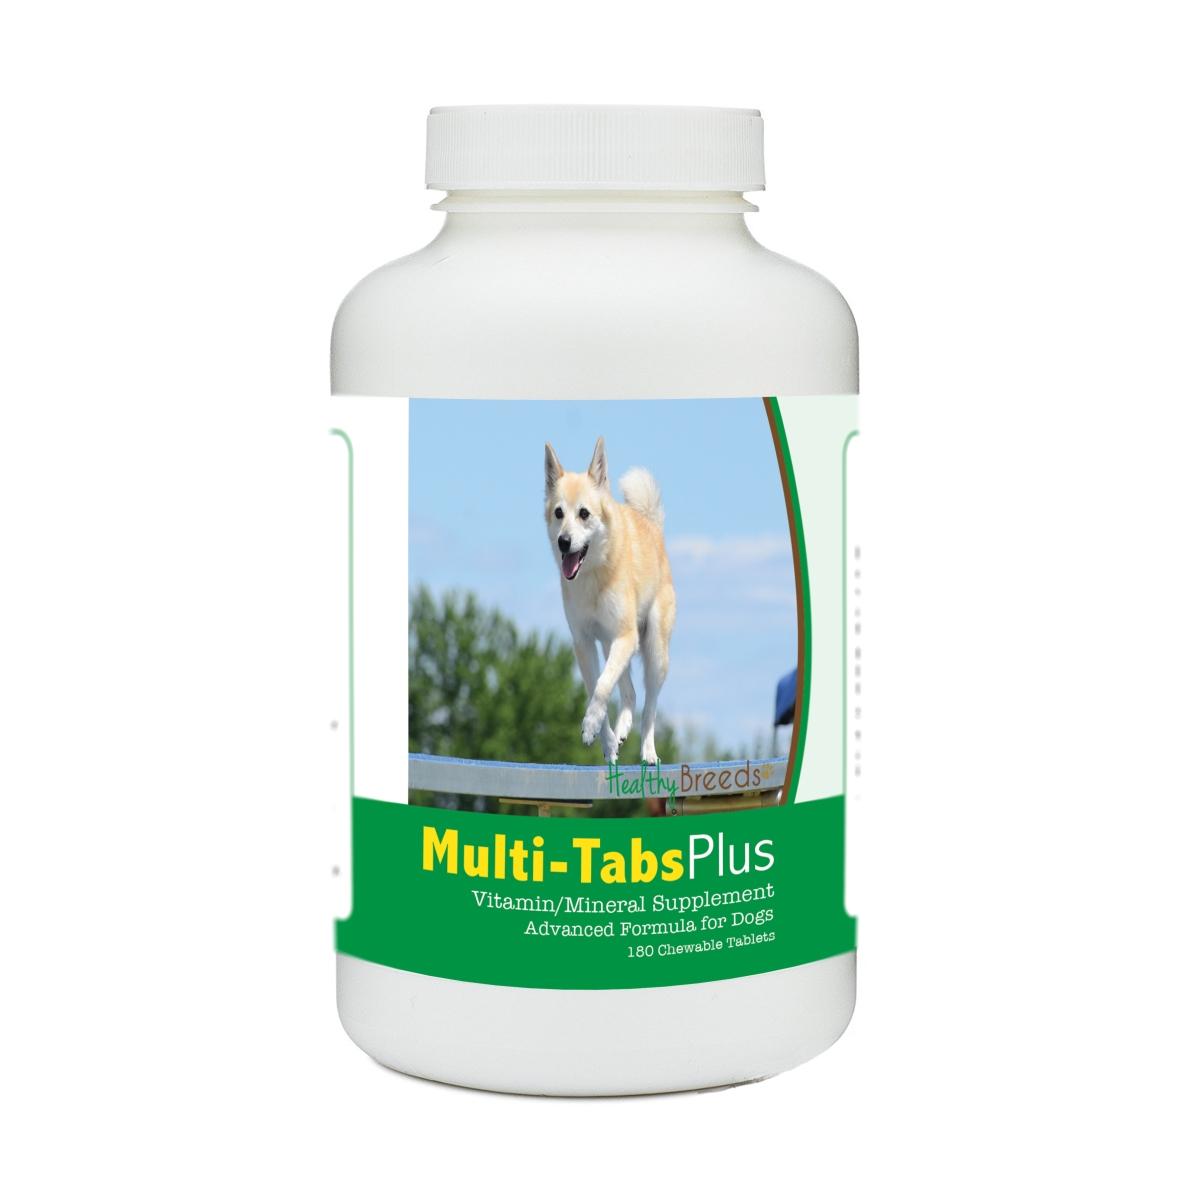 Healthy Breeds 840235171386 Norwegian Buhund Multi-Tabs Plus Chewable Tablets - 180 Count